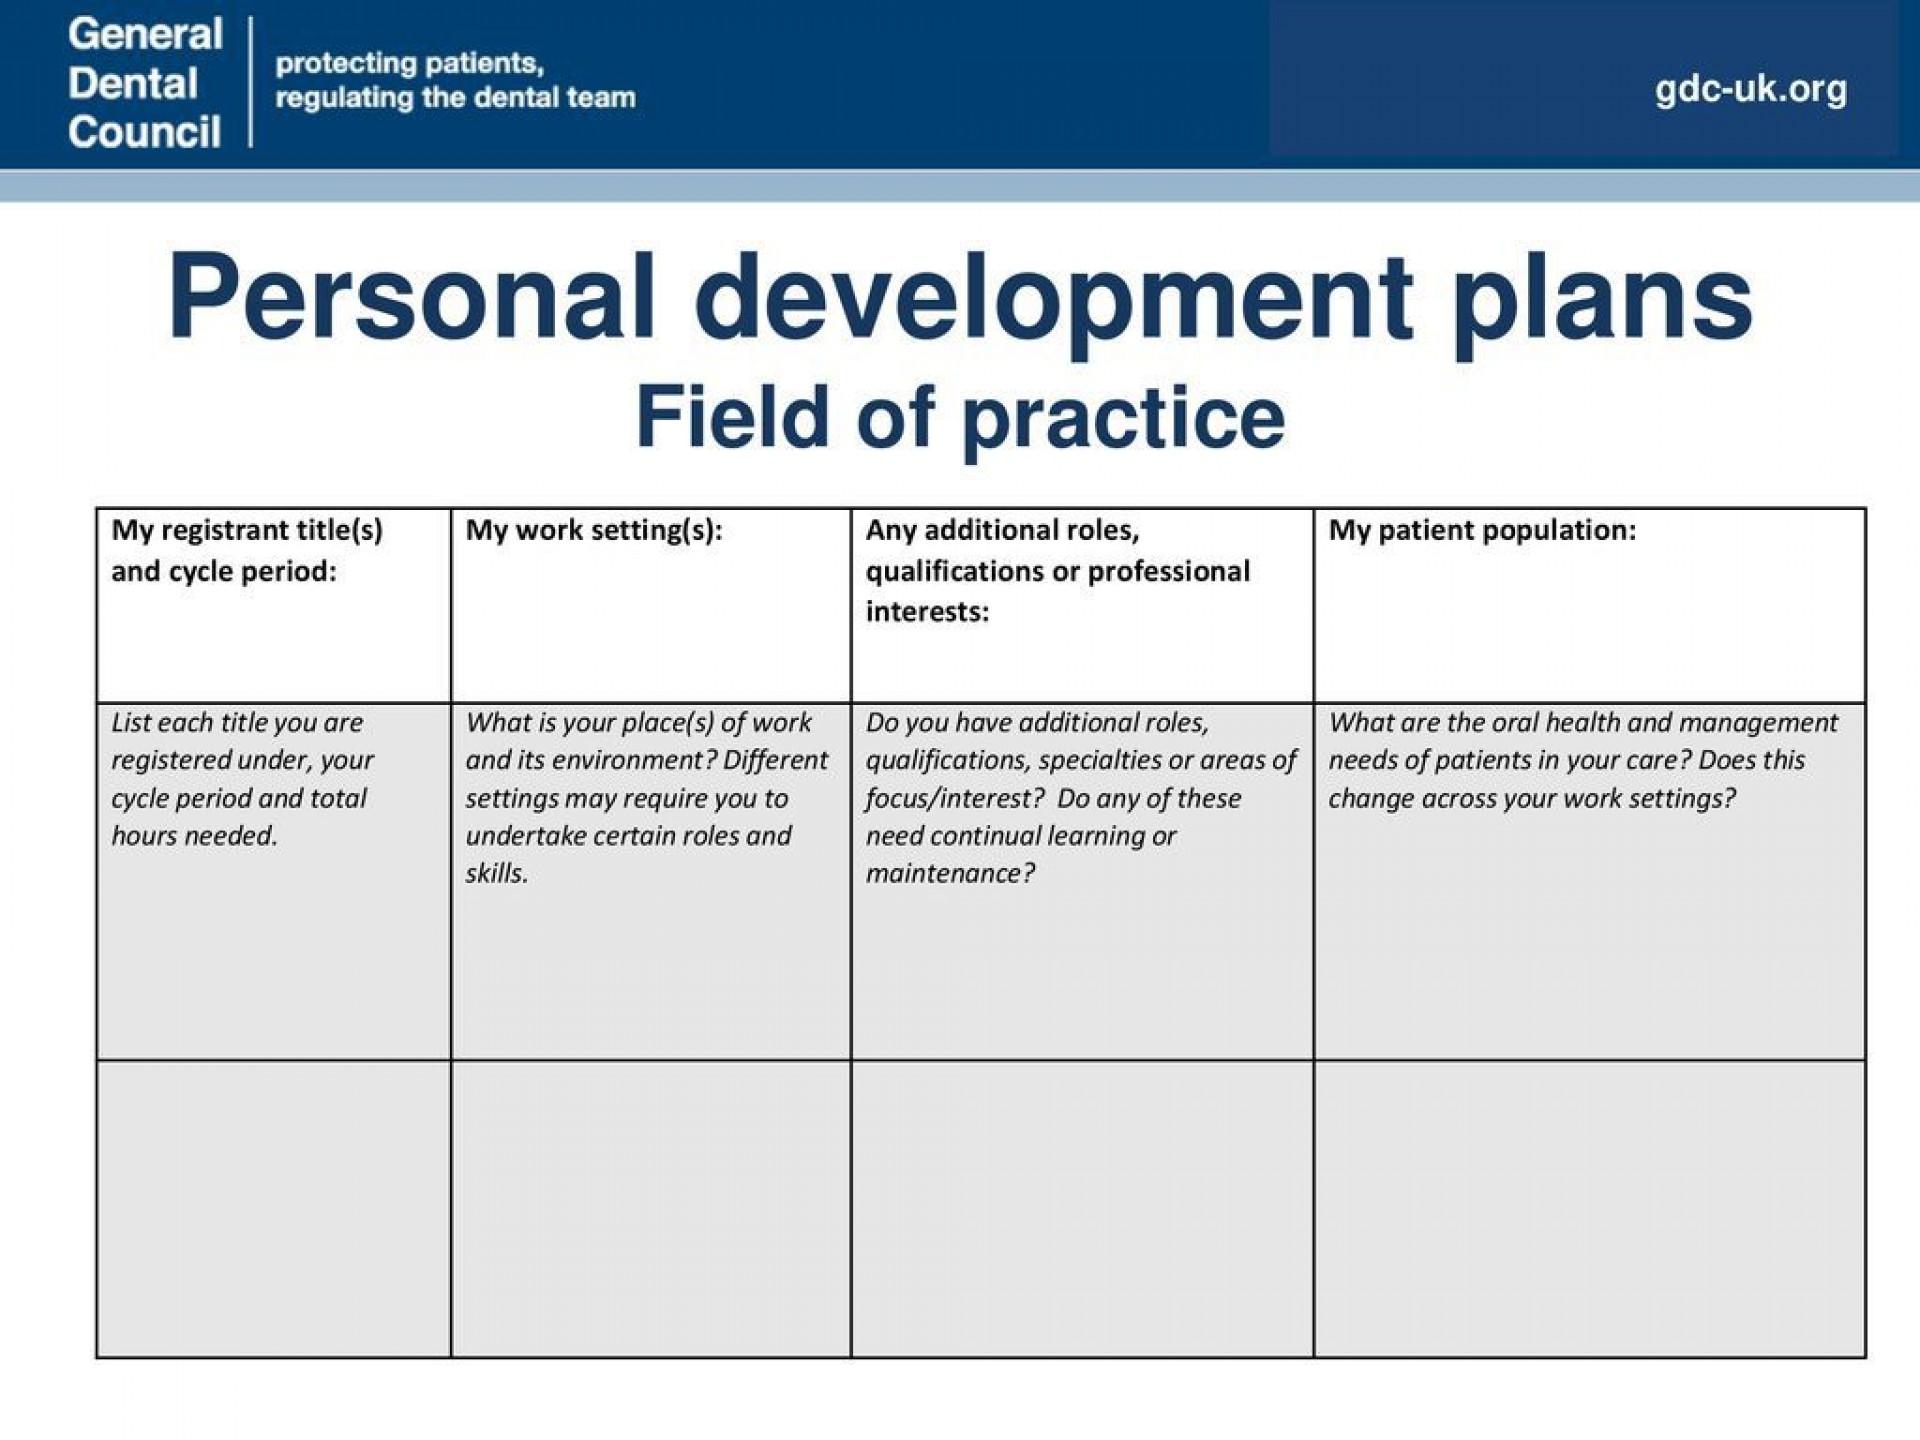 008 Incredible Personal Development Plan Template Gdc Inspiration  Free1920